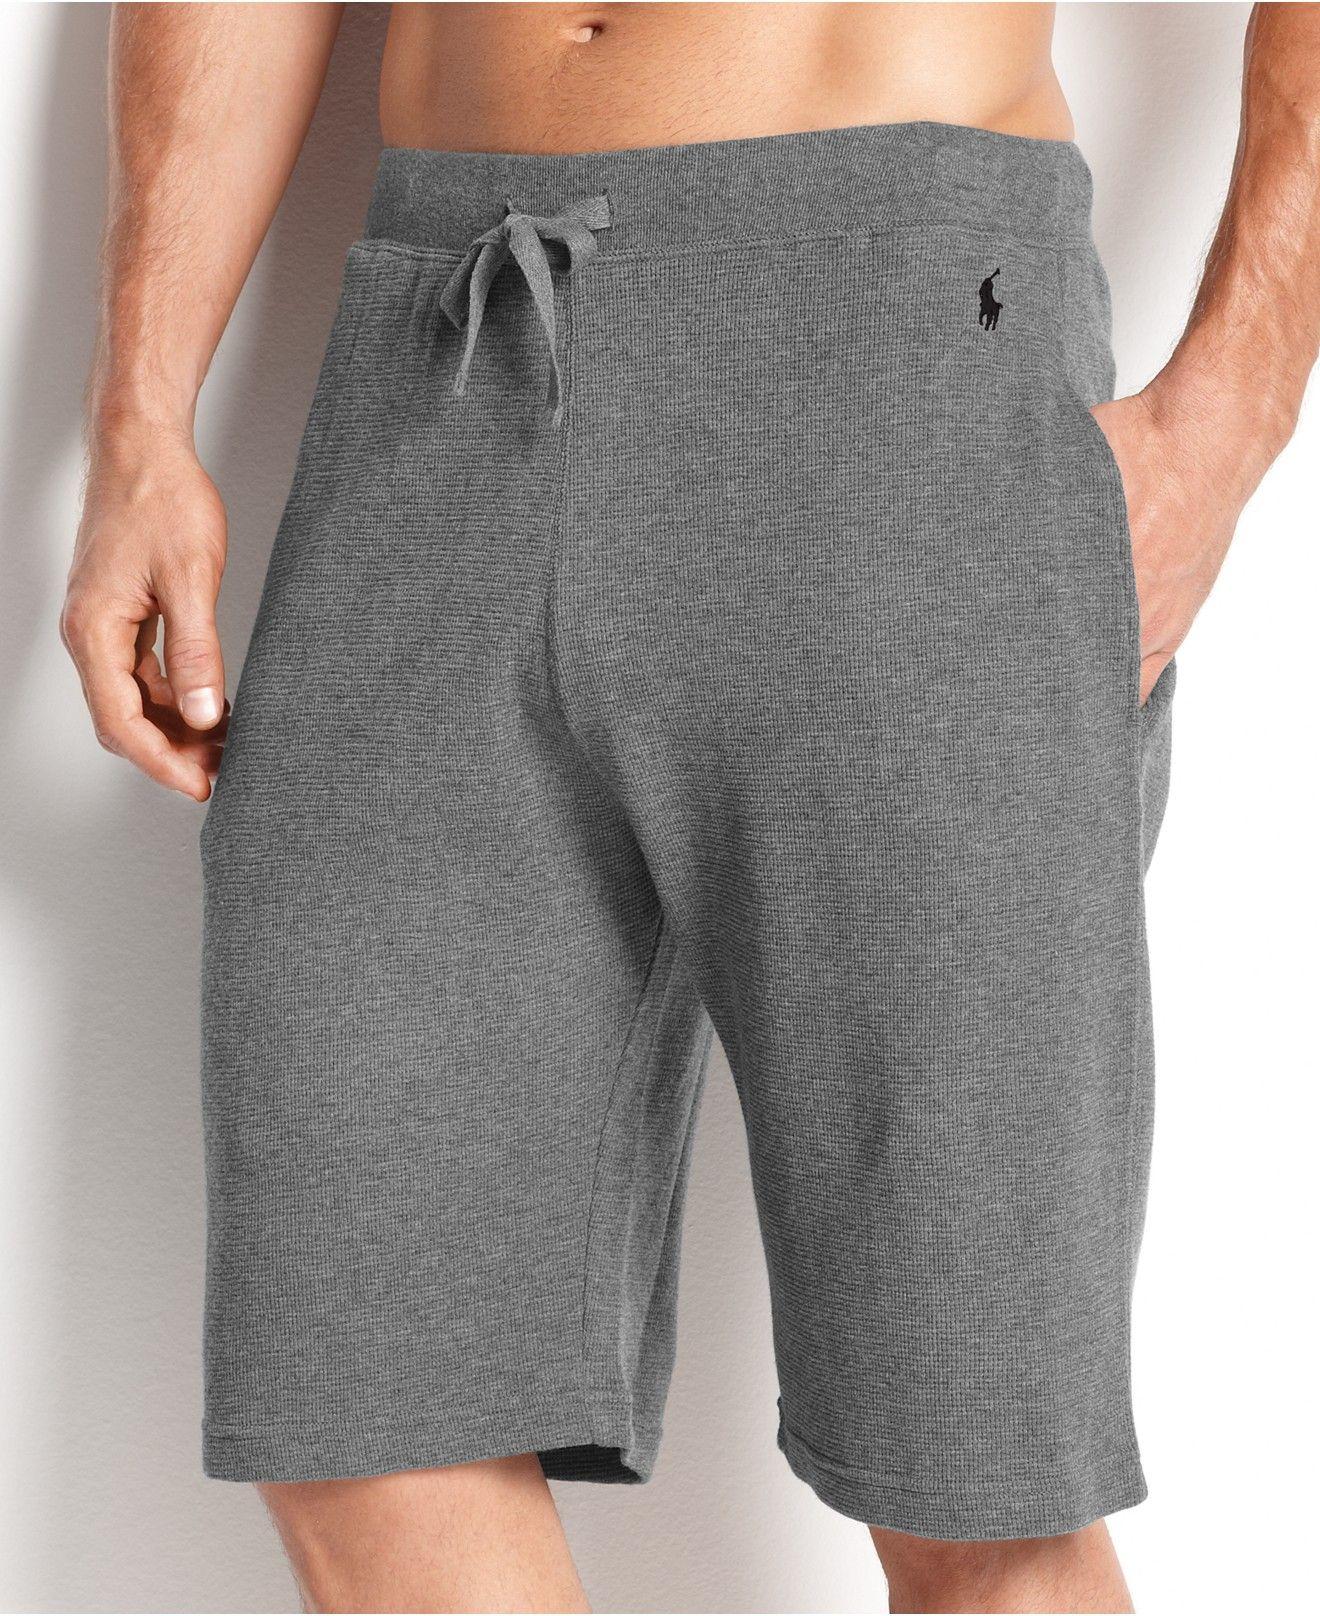 79eb5fa3e4a0b Polo Ralph Lauren Men s Loungewear